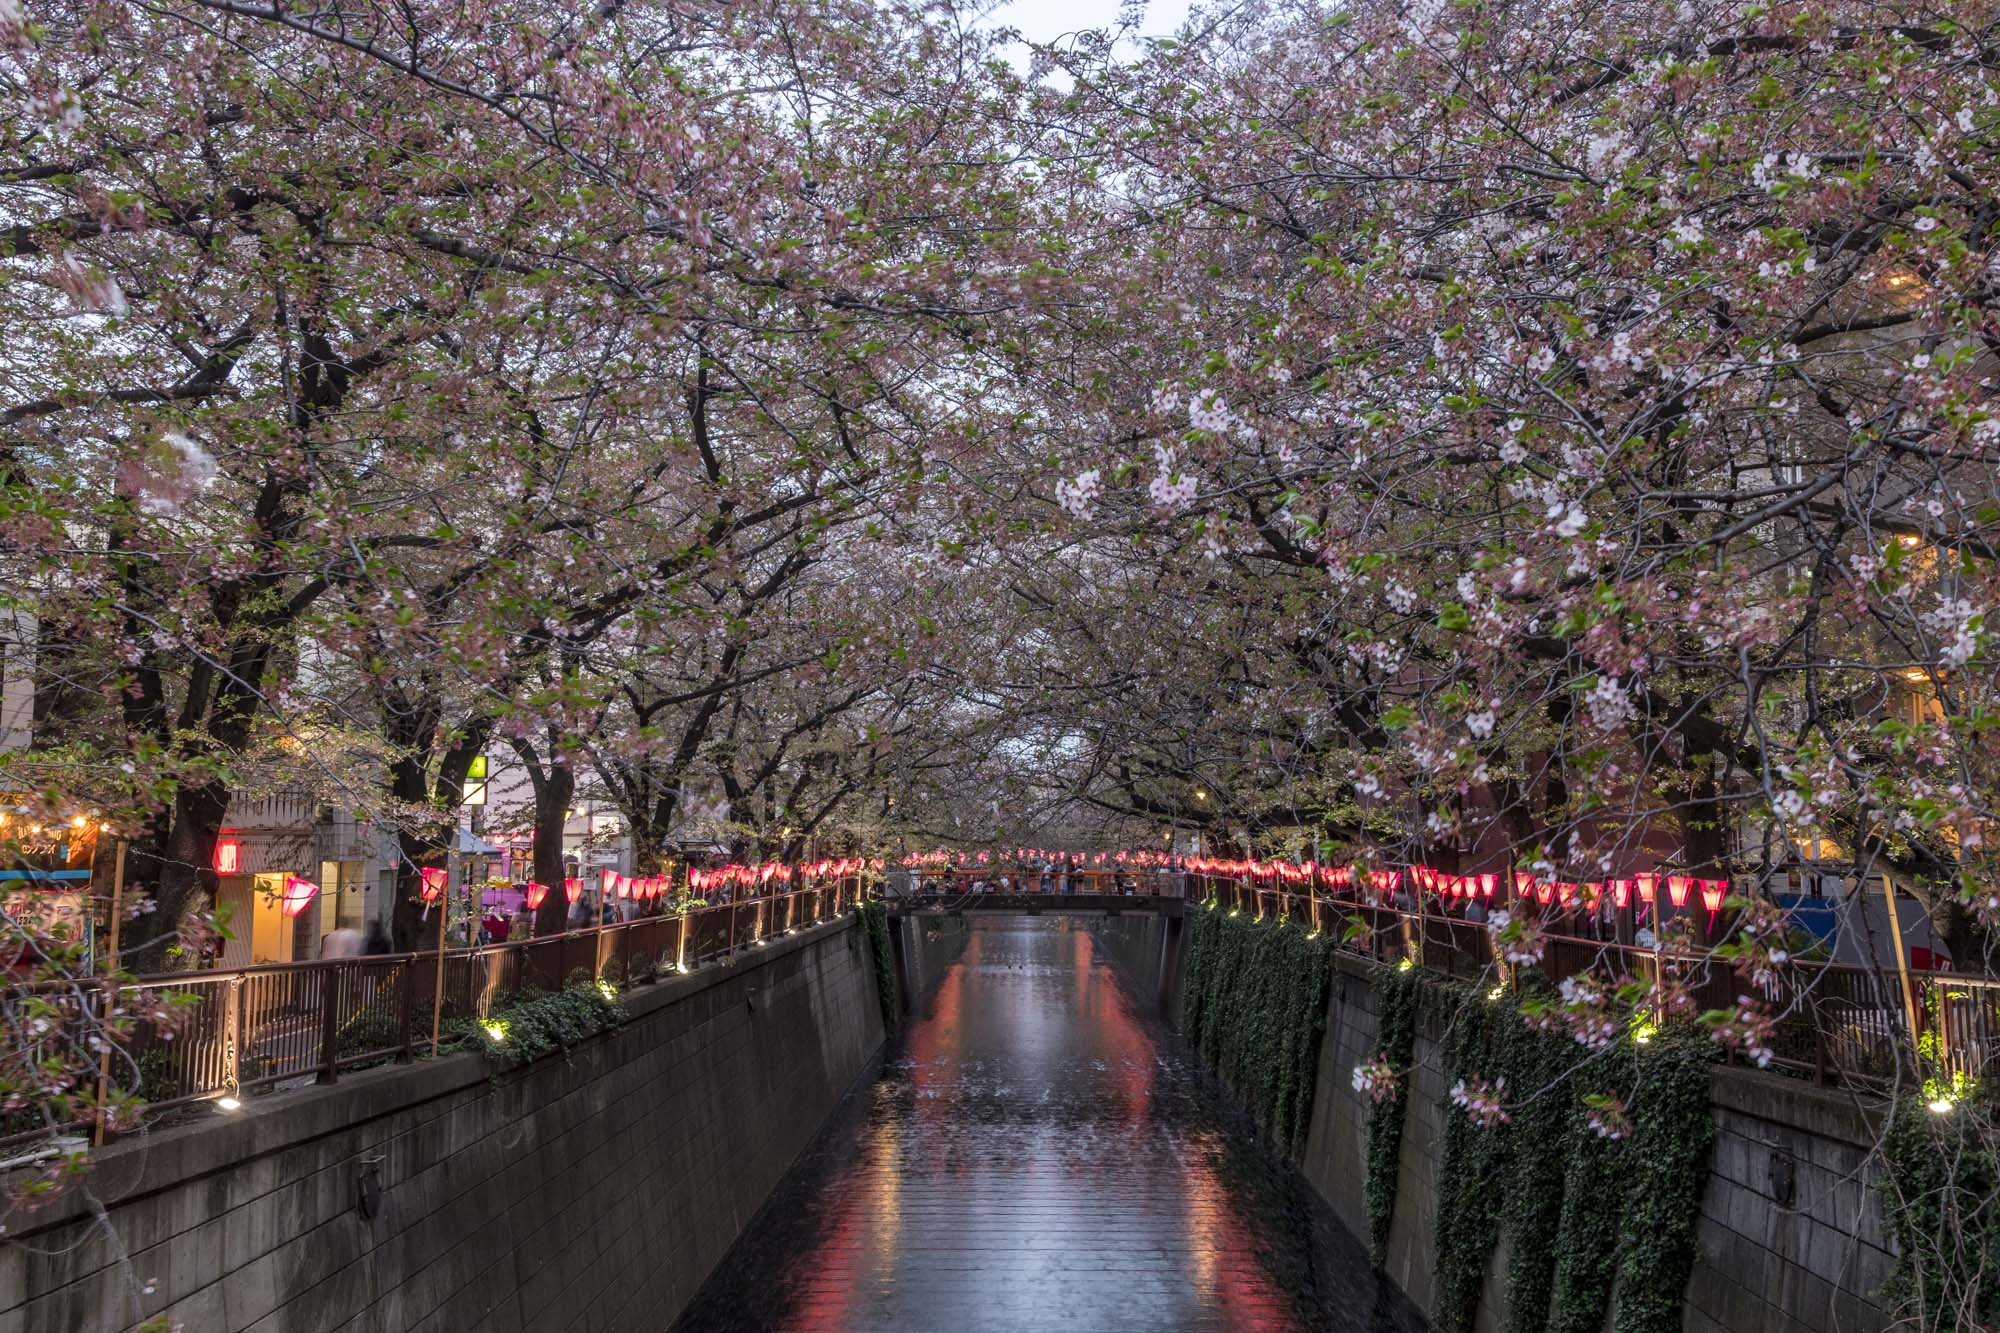 Meguro-gawa dans la ville de Tōkyō au Japon